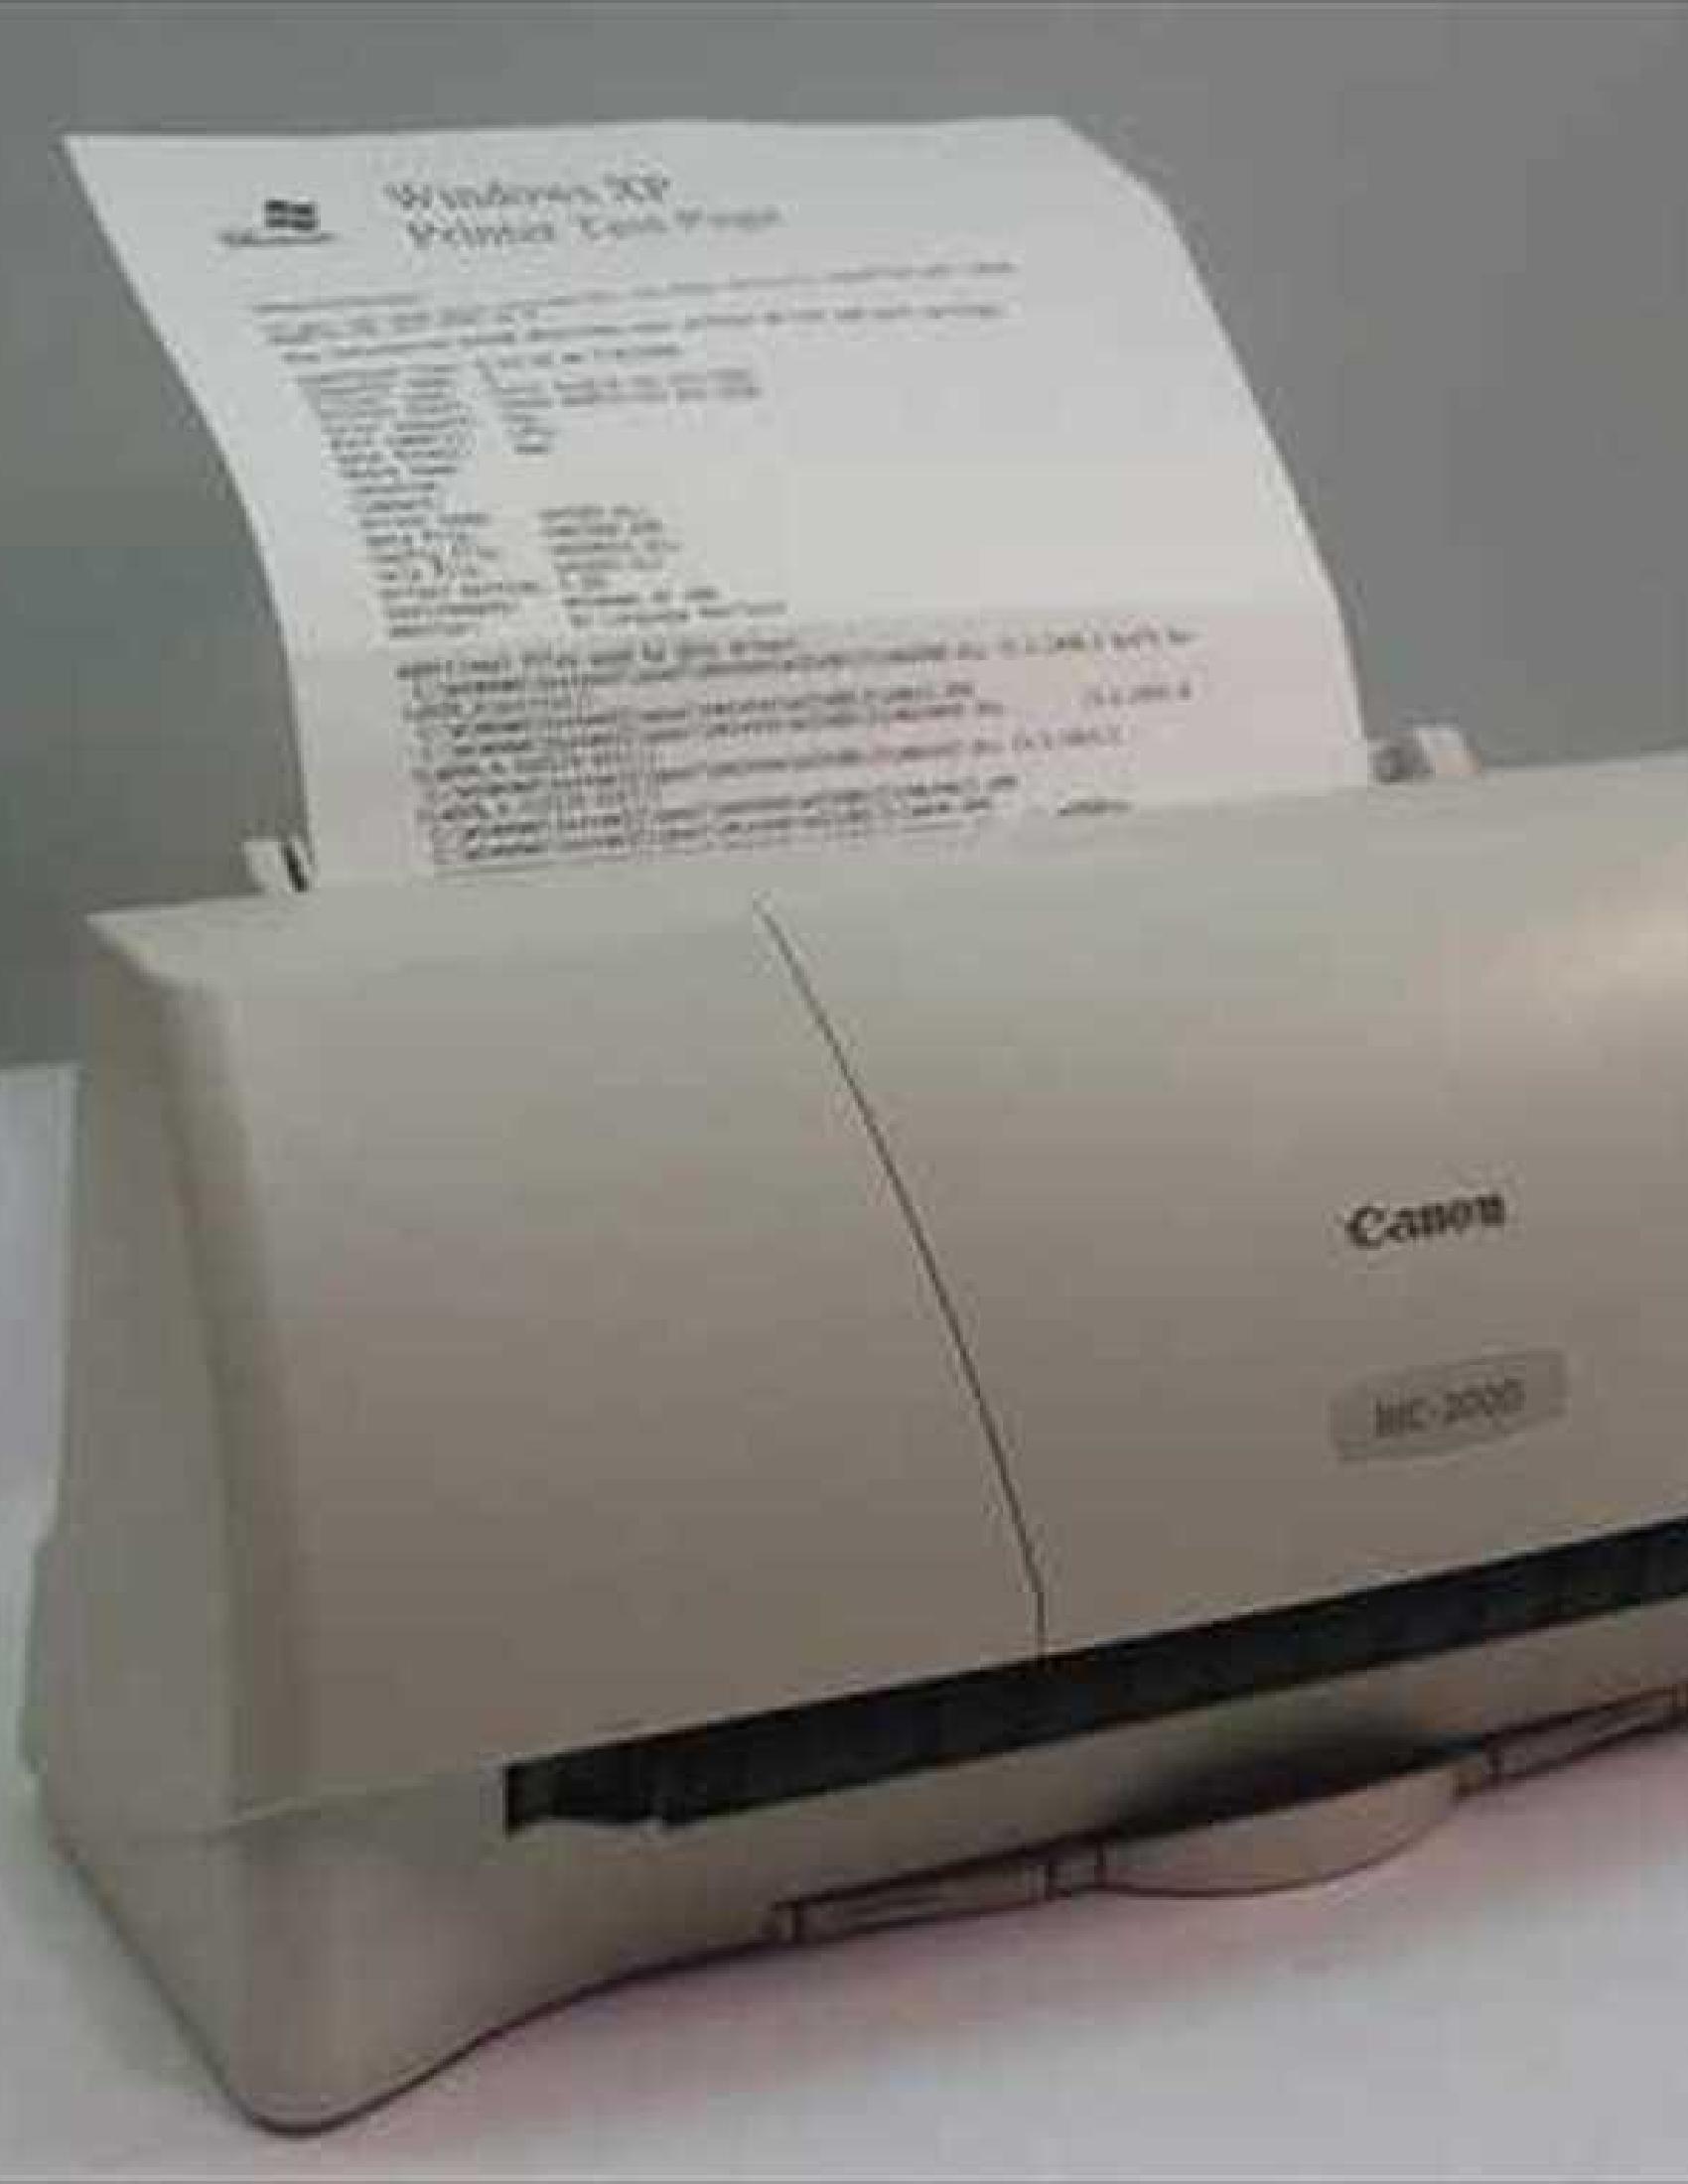 Canon BJC-2000 Printer manual